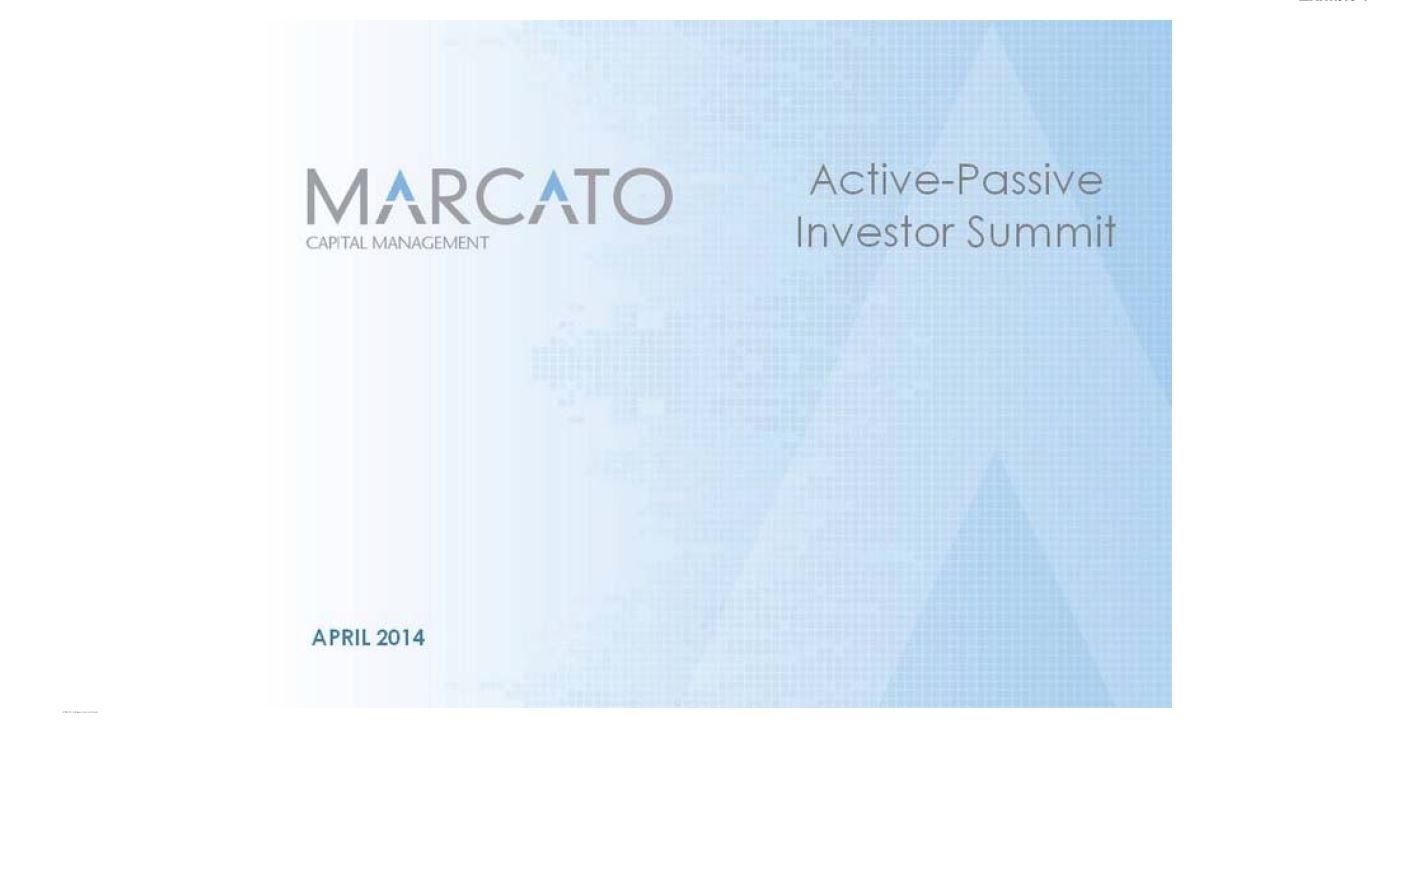 Marcato Sotheby's Presentation (Apr-2014)